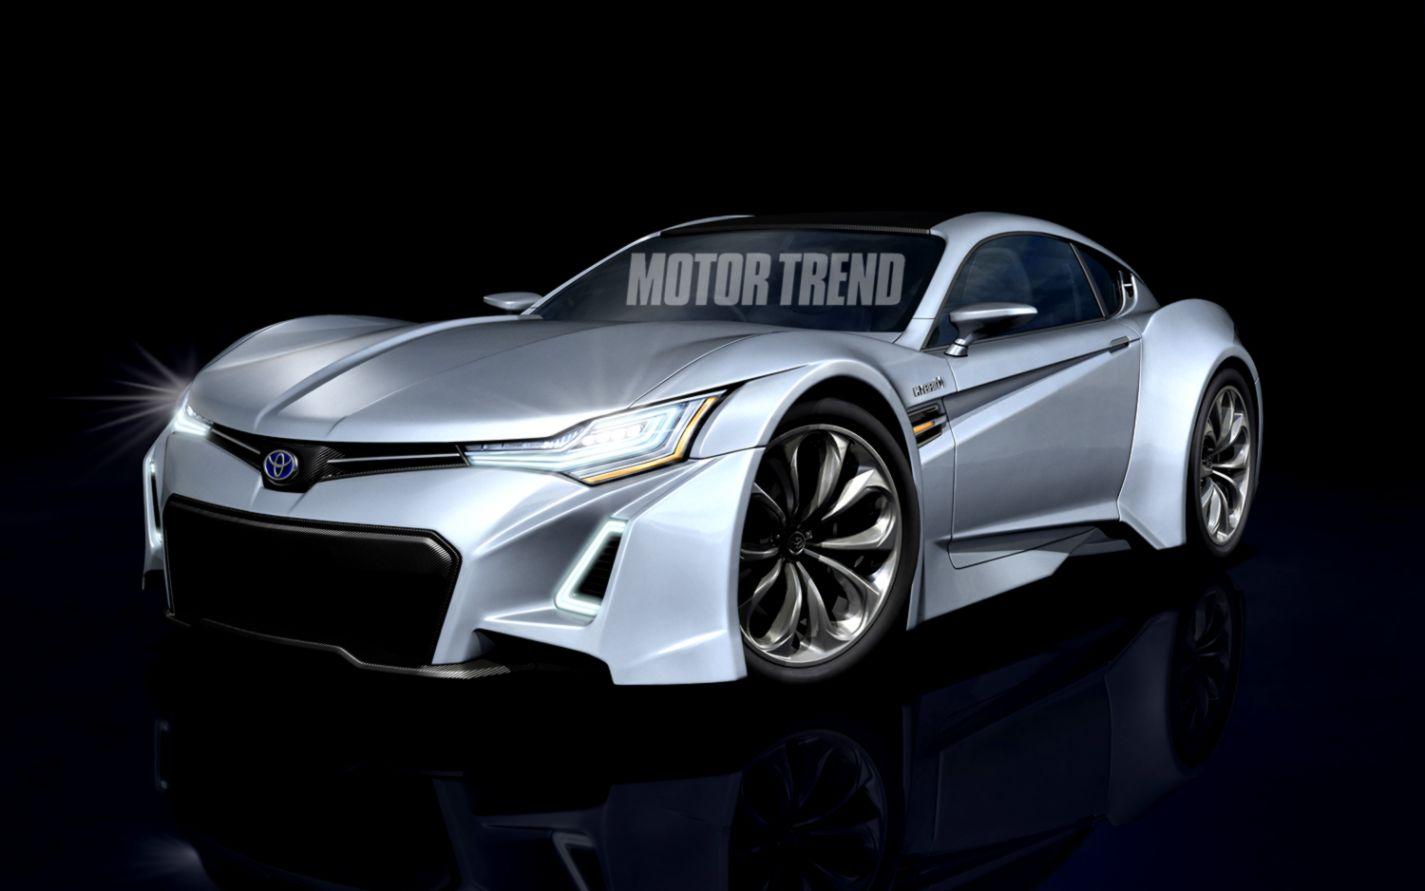 Toyota Hybrid Concept Car Wallpaper Hd Wallpaper Background Hd